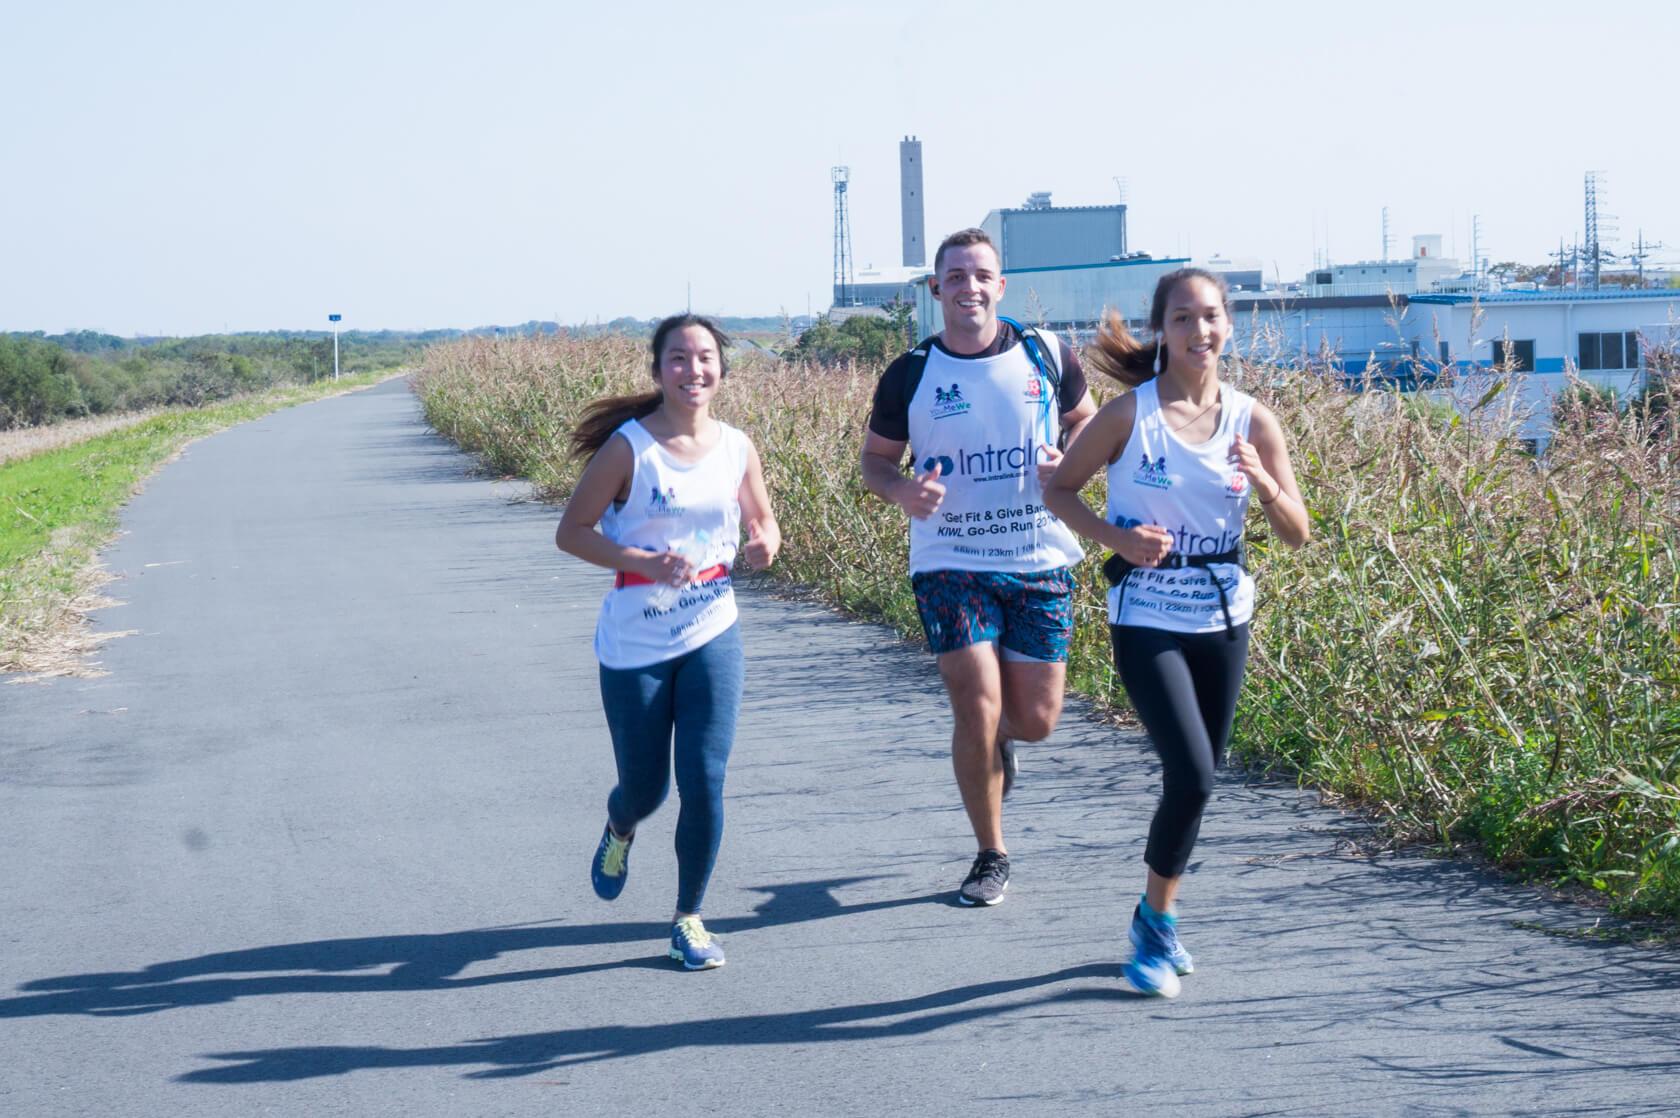 Go-Go Charity Run by KIWL